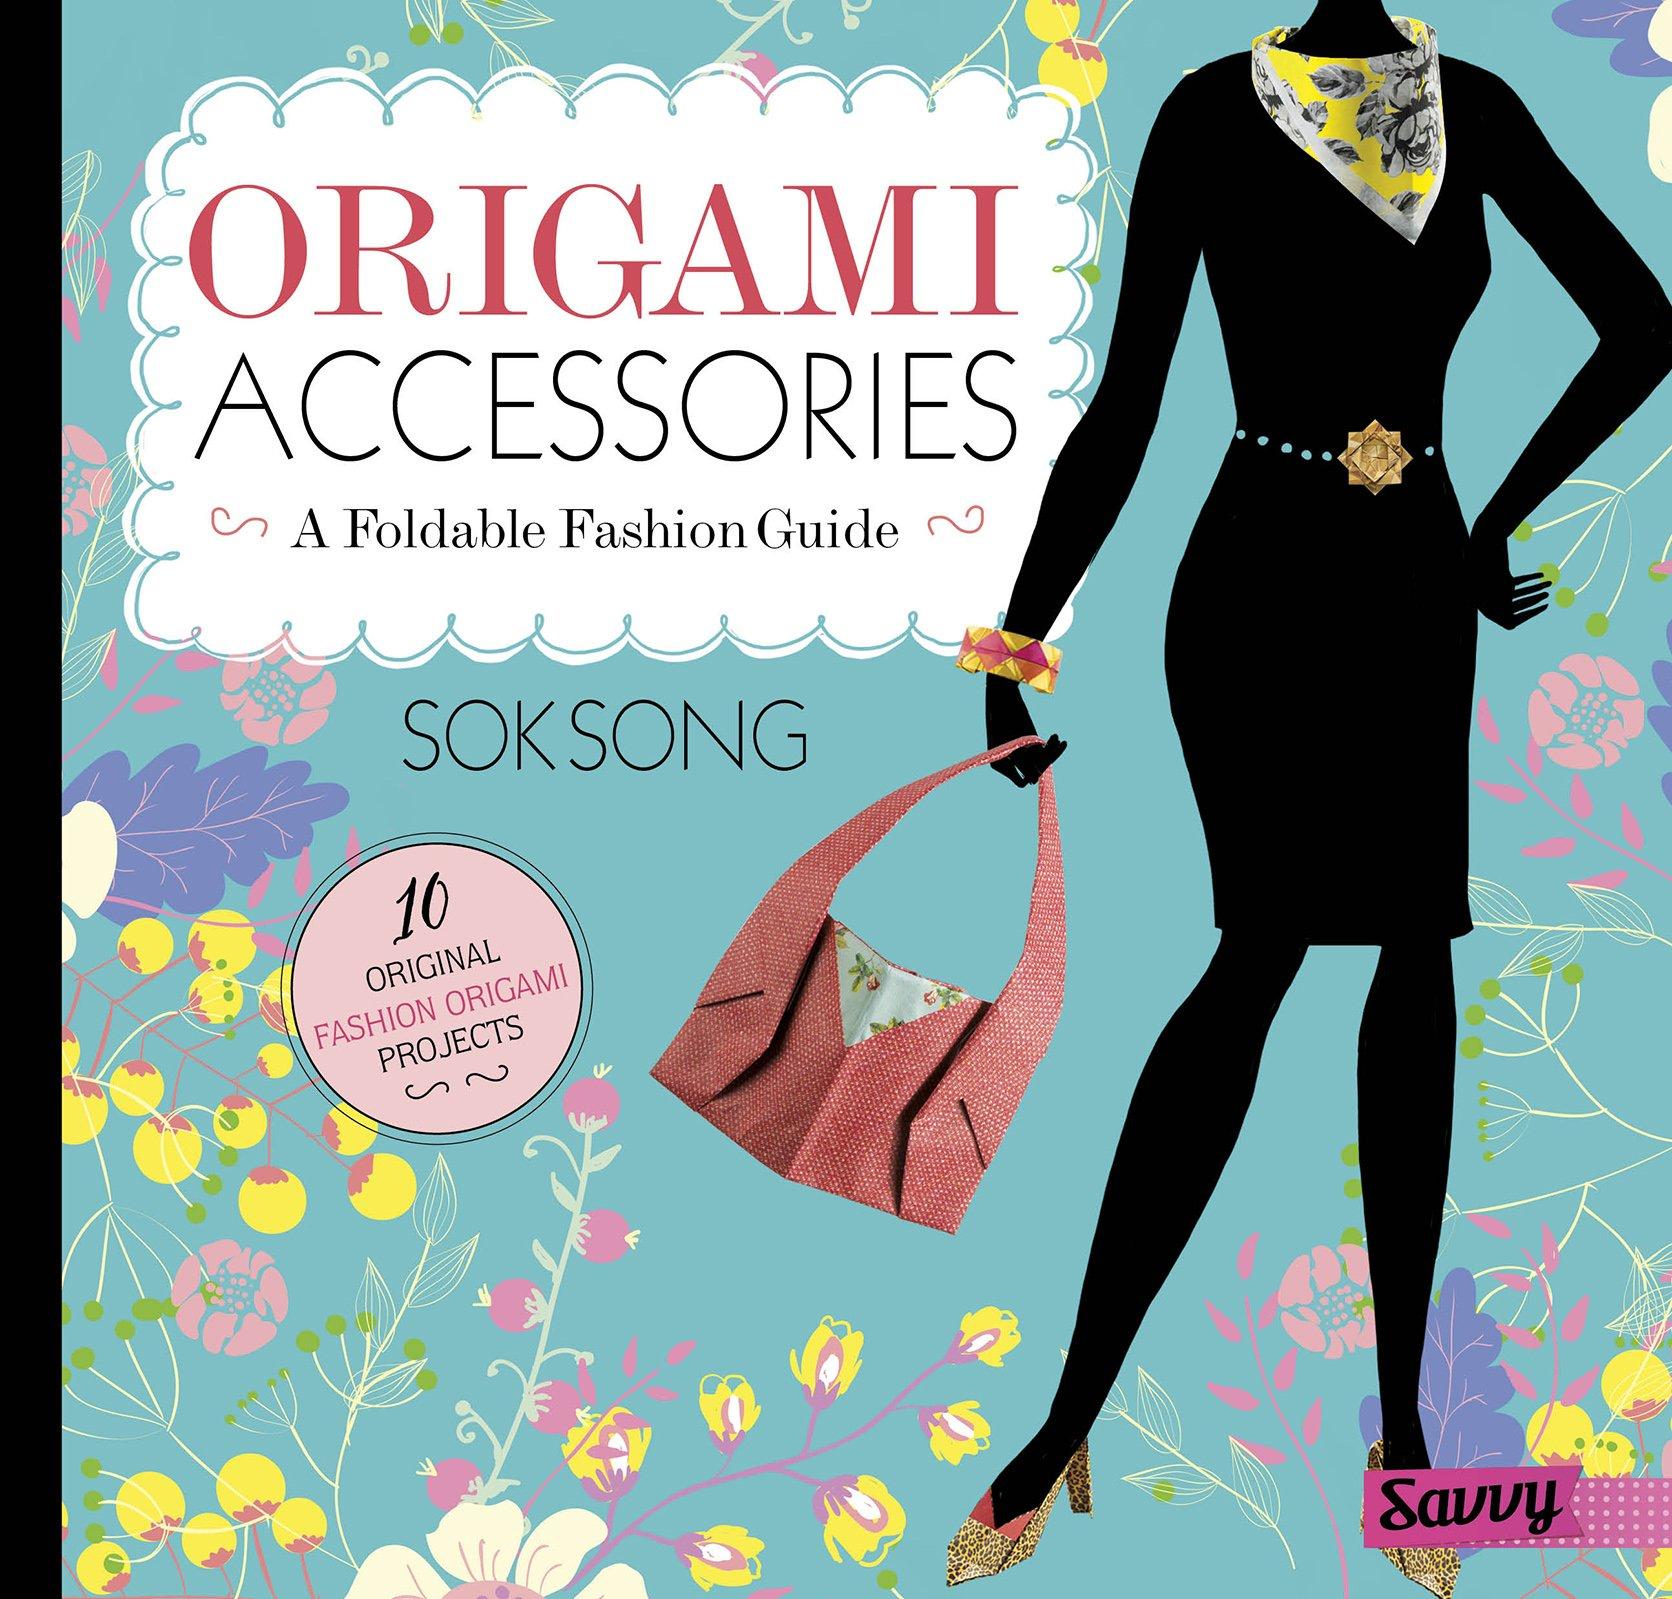 Origami Accessories: A Foldable Fashion Guide (Fashion Origami)